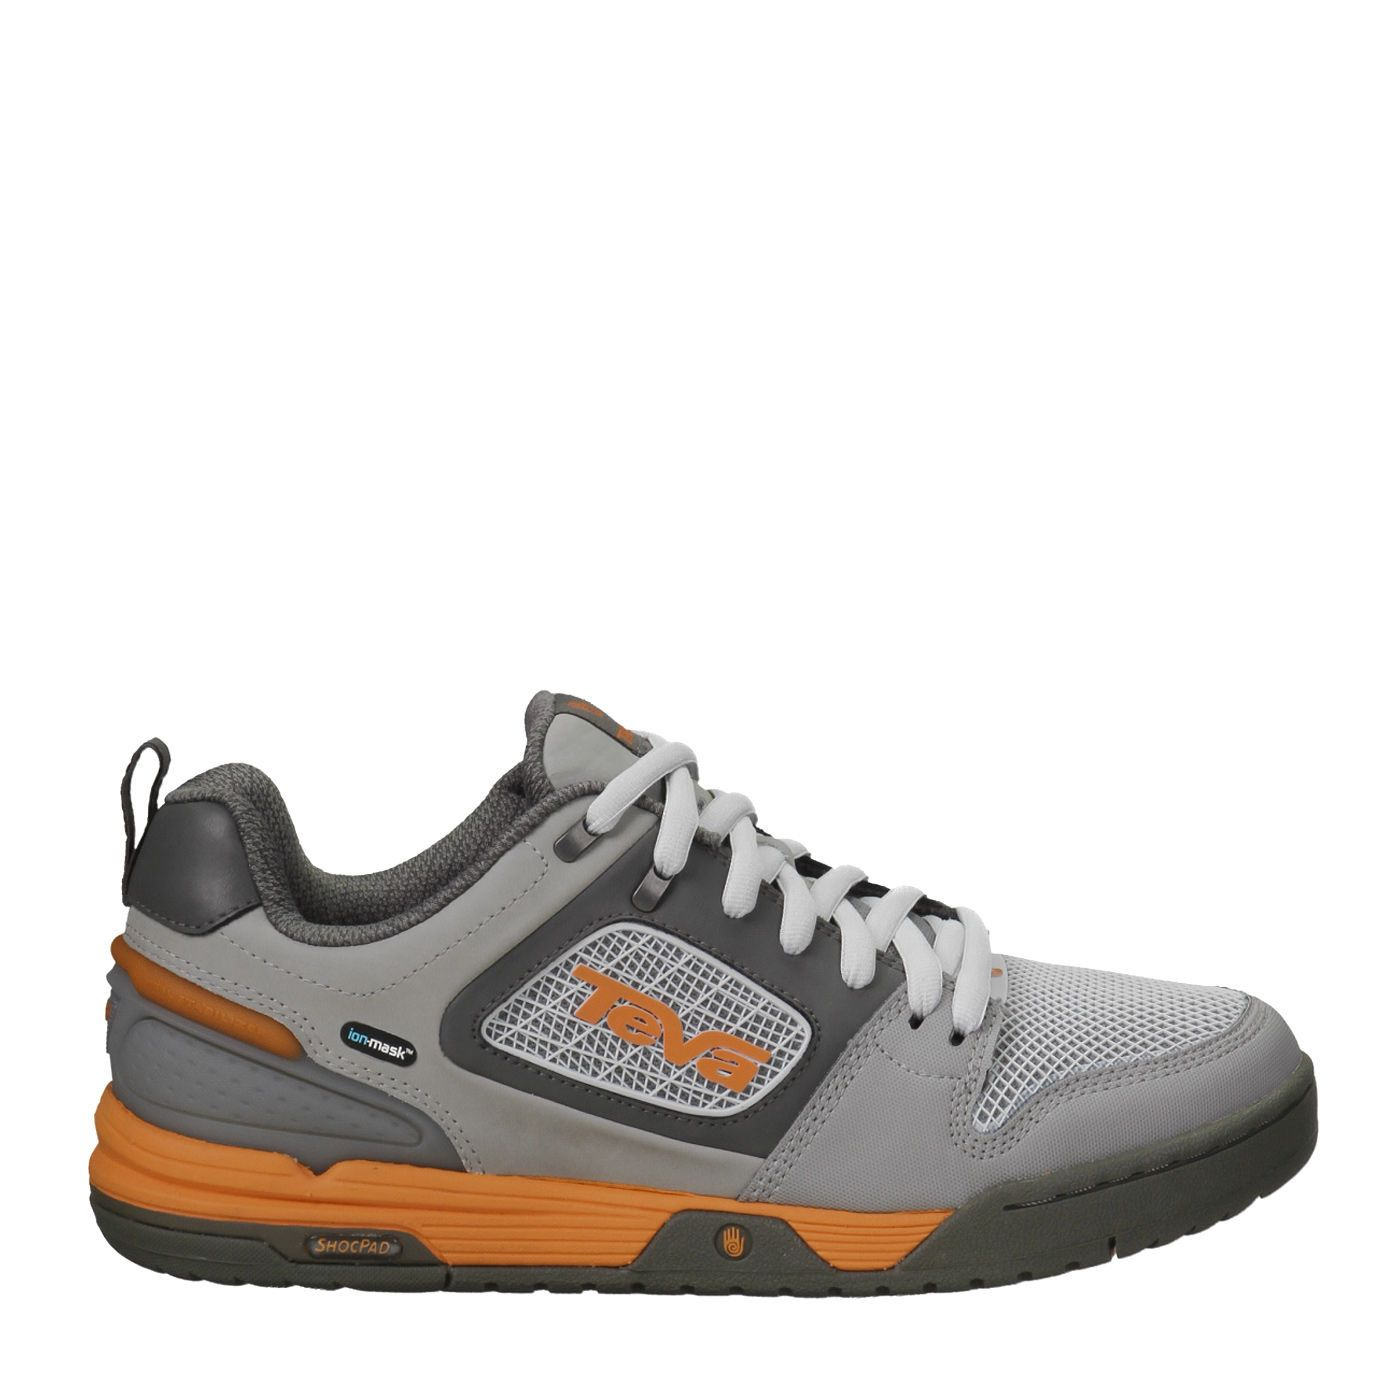 Teva® Links for Men | Mountain Biking Shoes at Teva.com .